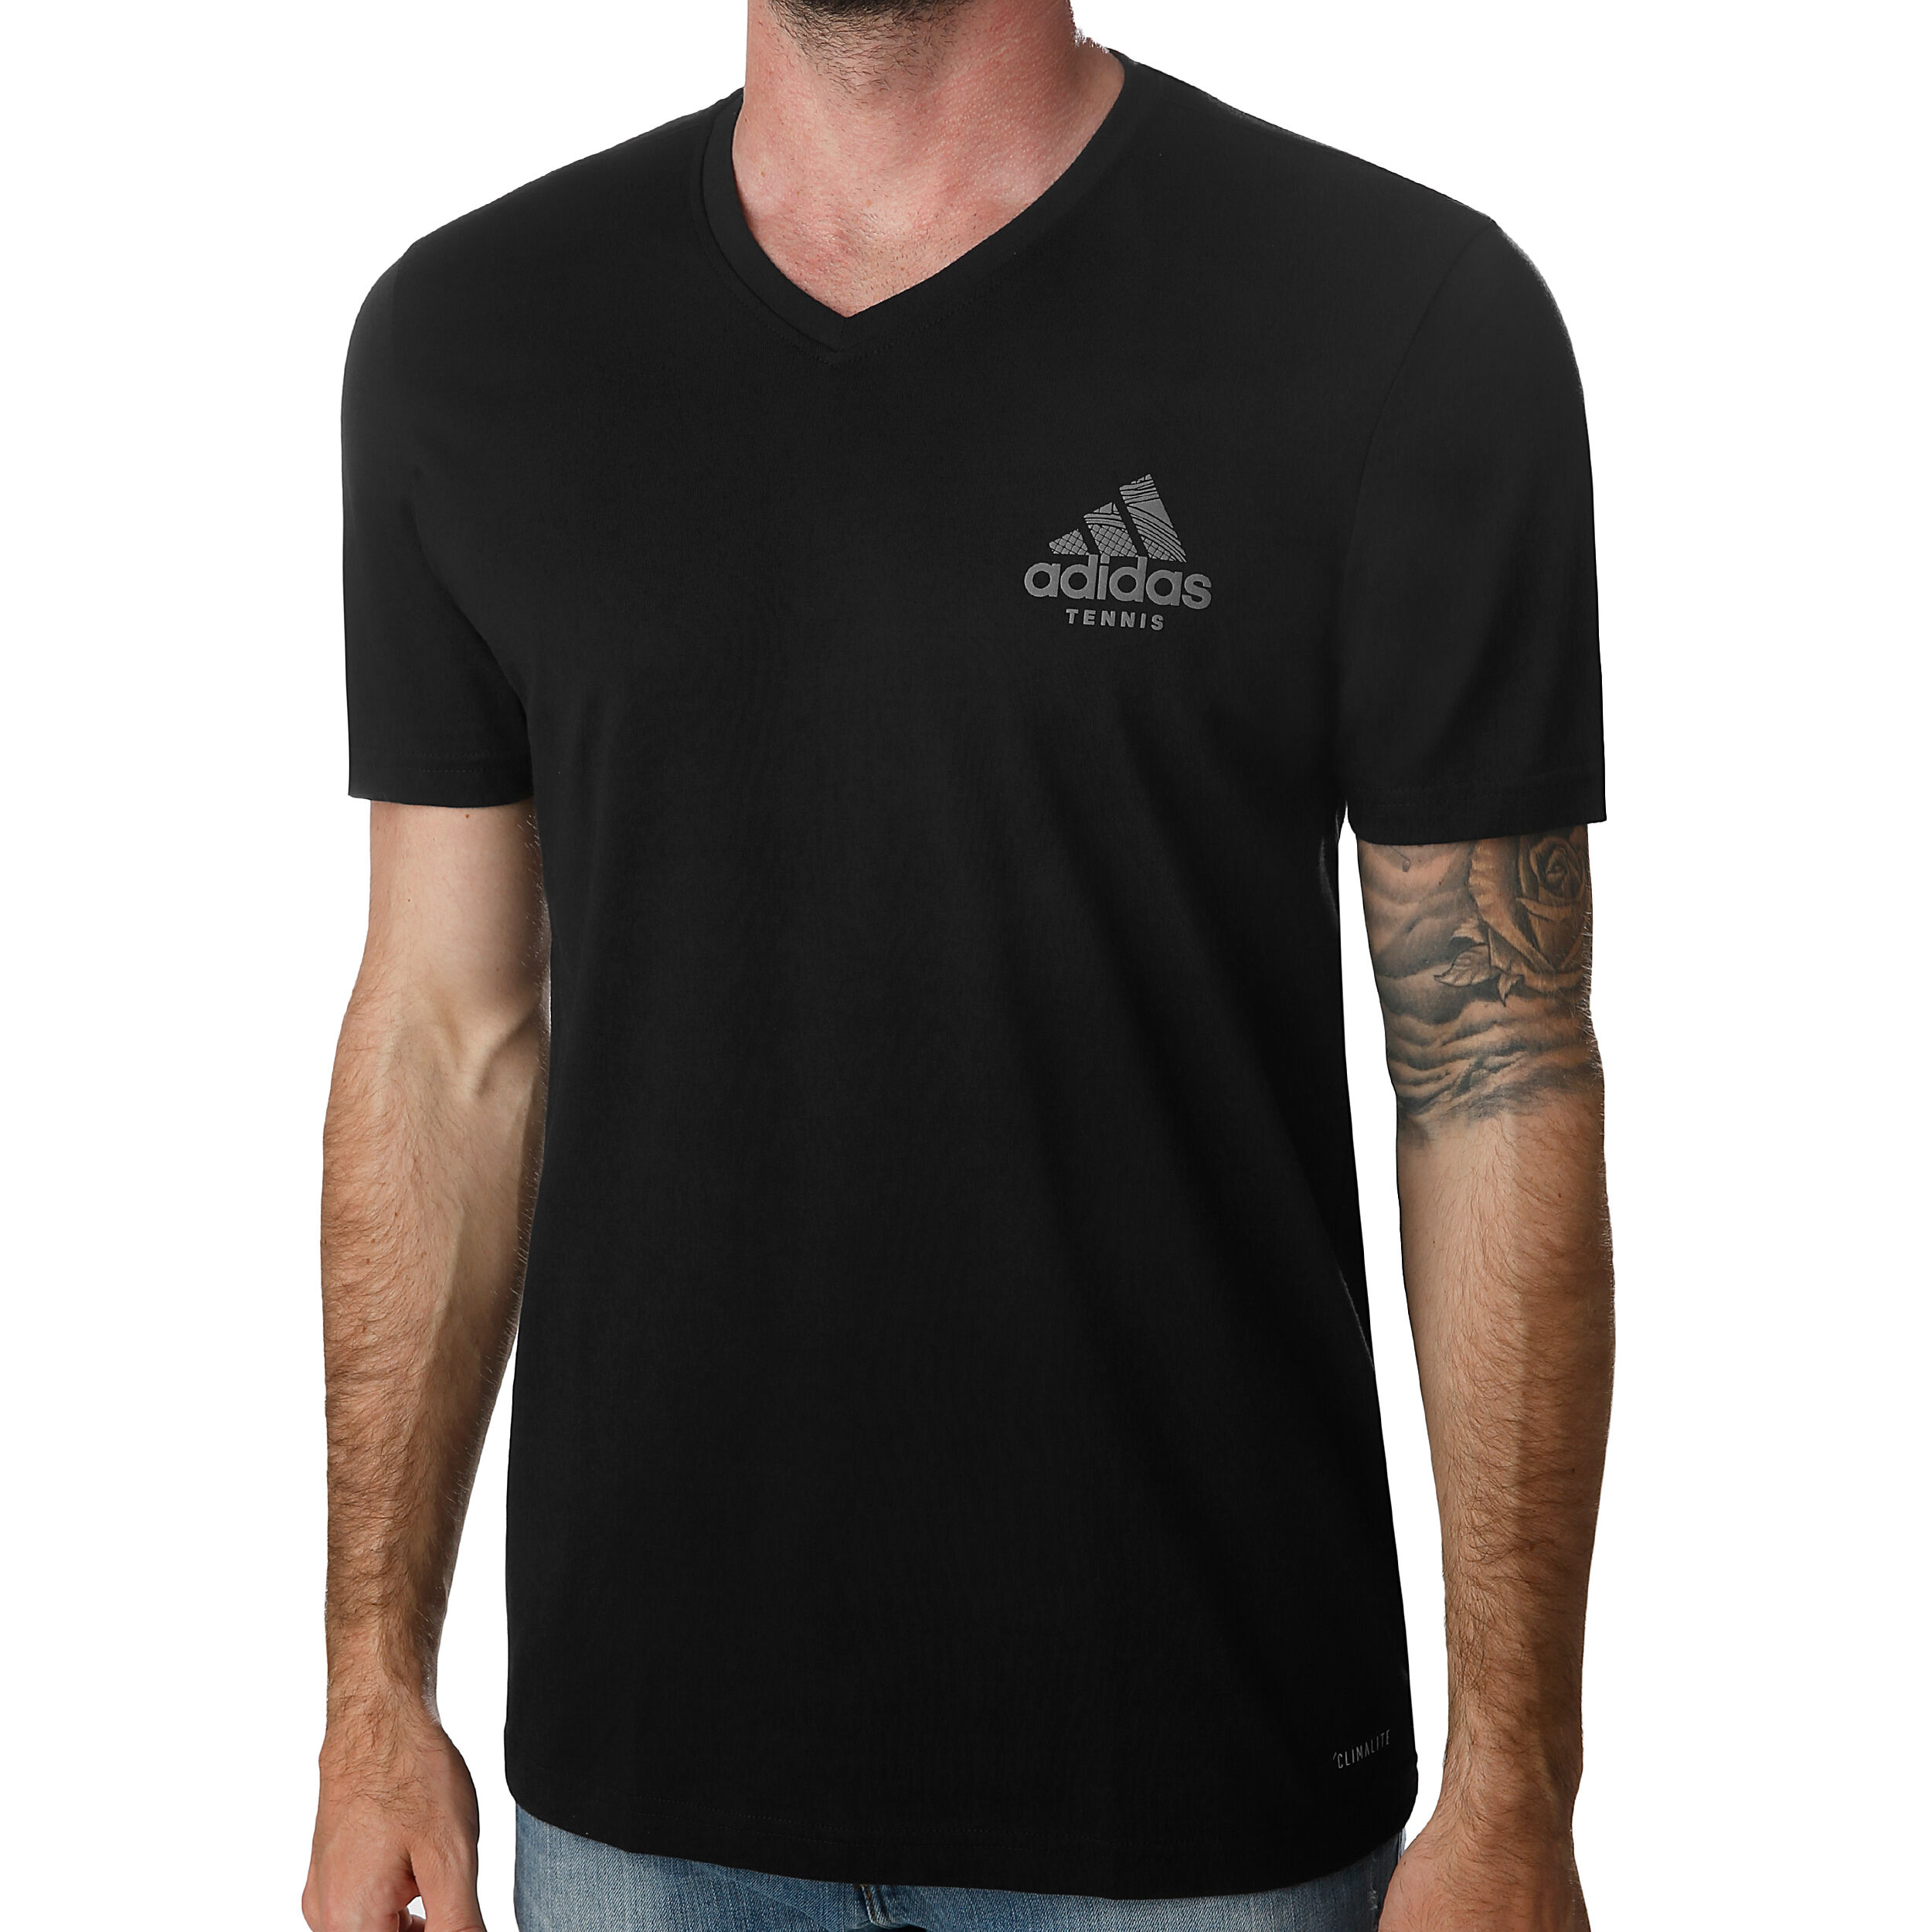 buy adidas V-Neck Graphic T-Shirt Men - Black, Silver online ...